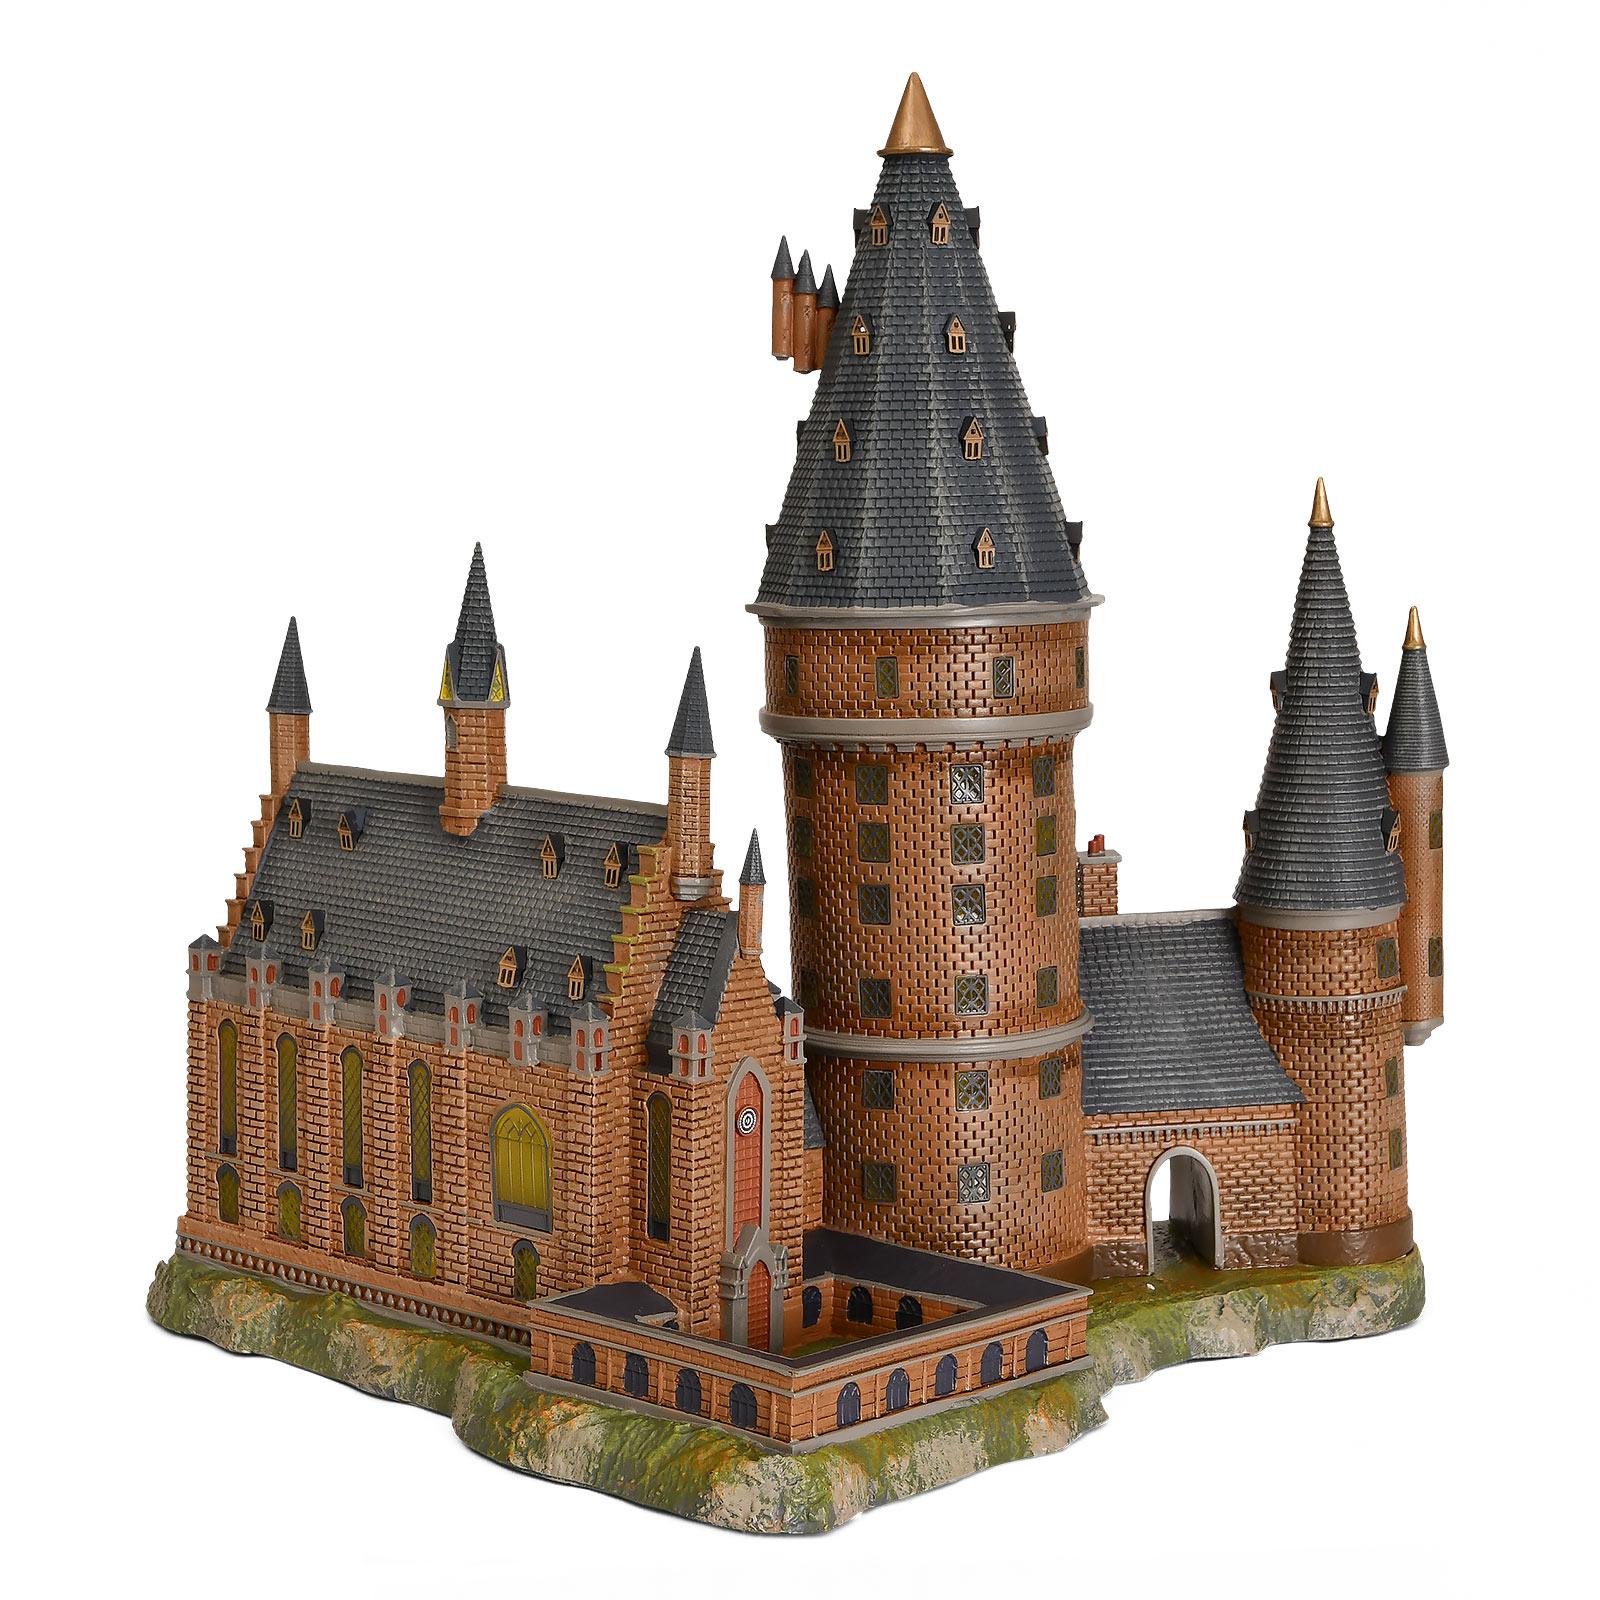 Hogwarts Große Halle mit Hauptturm Miniatur Replik mit Beleuchtung - Harry Potter